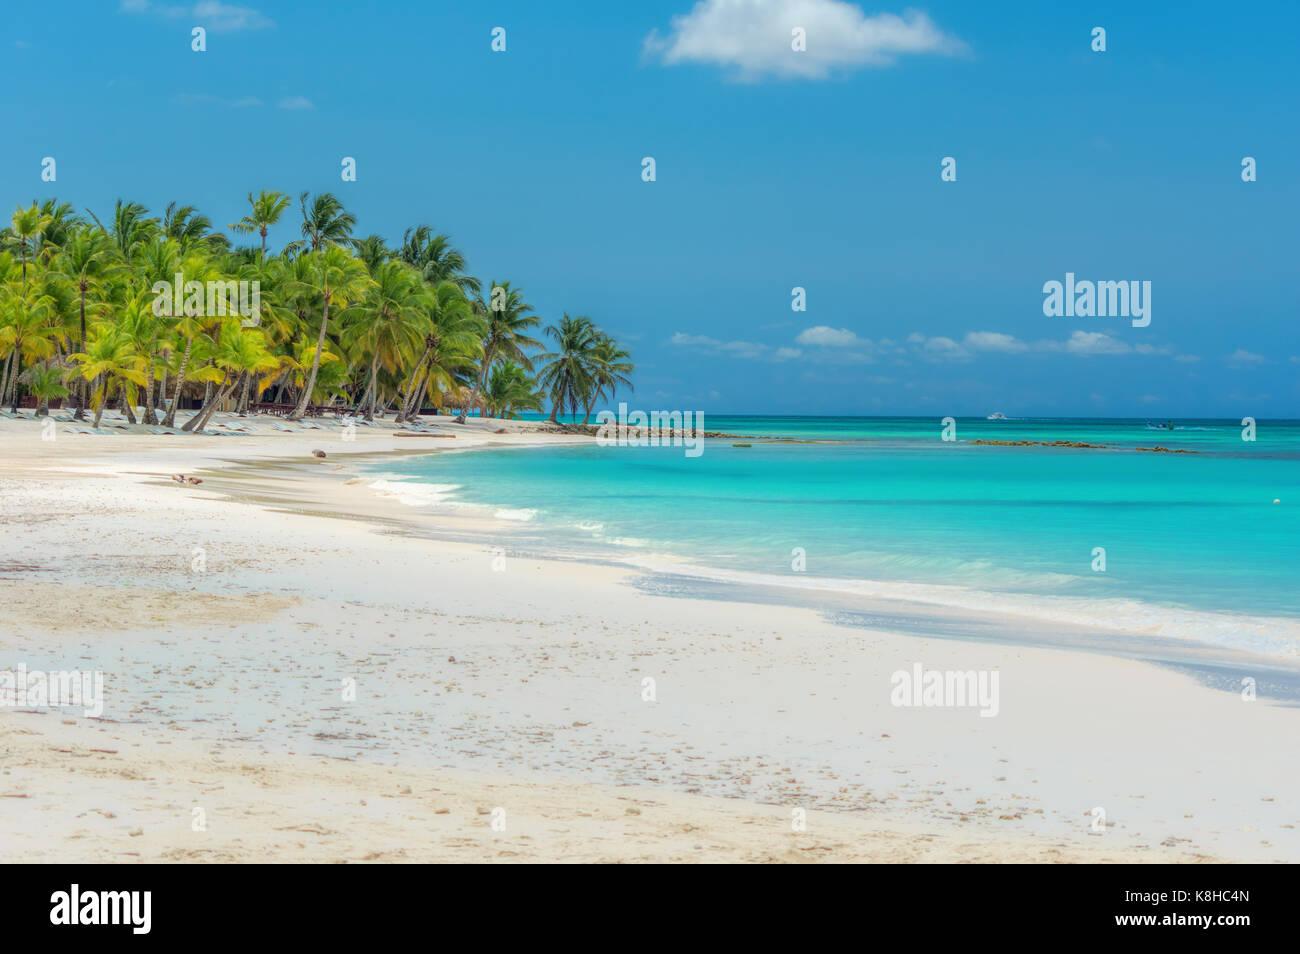 Beach on the Caribbean island of Saona in Dominican Republic. Stock Photo